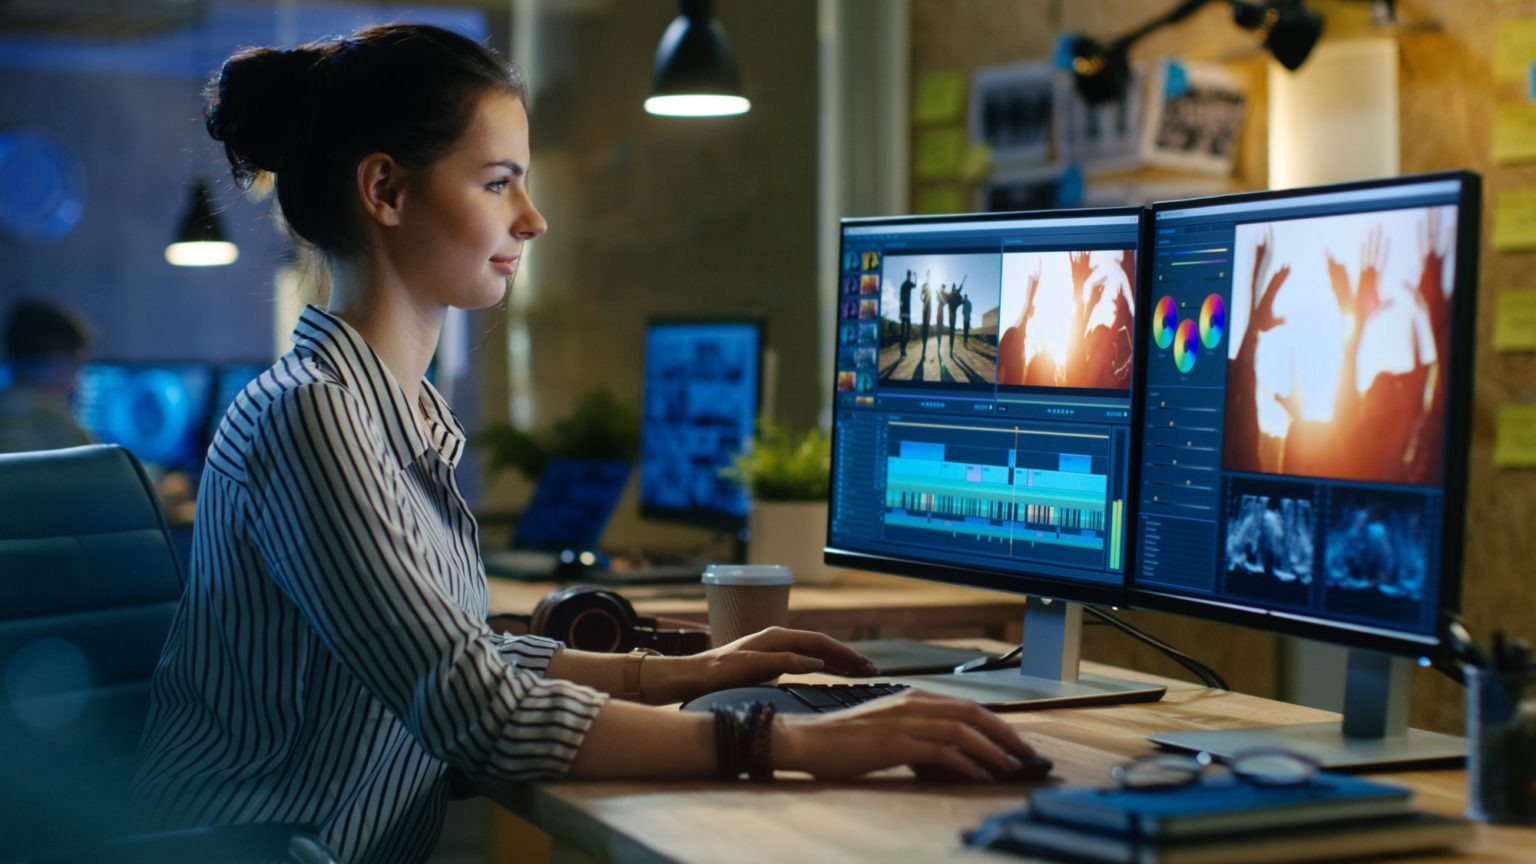 Image Editing Tools and 5 Video Editing Tools